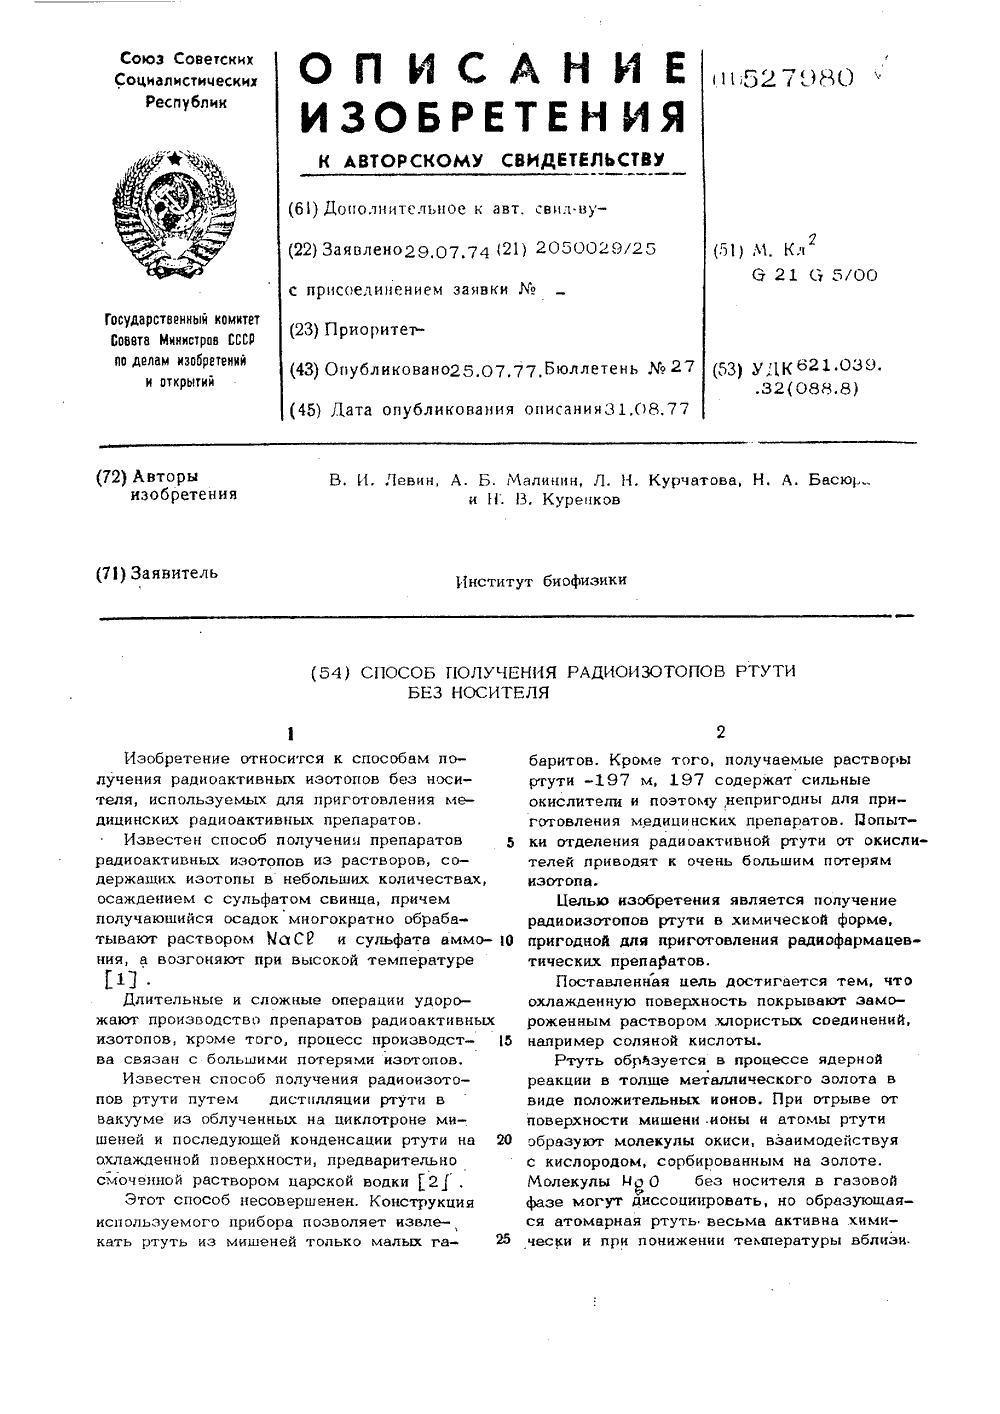 Радиоизотоп